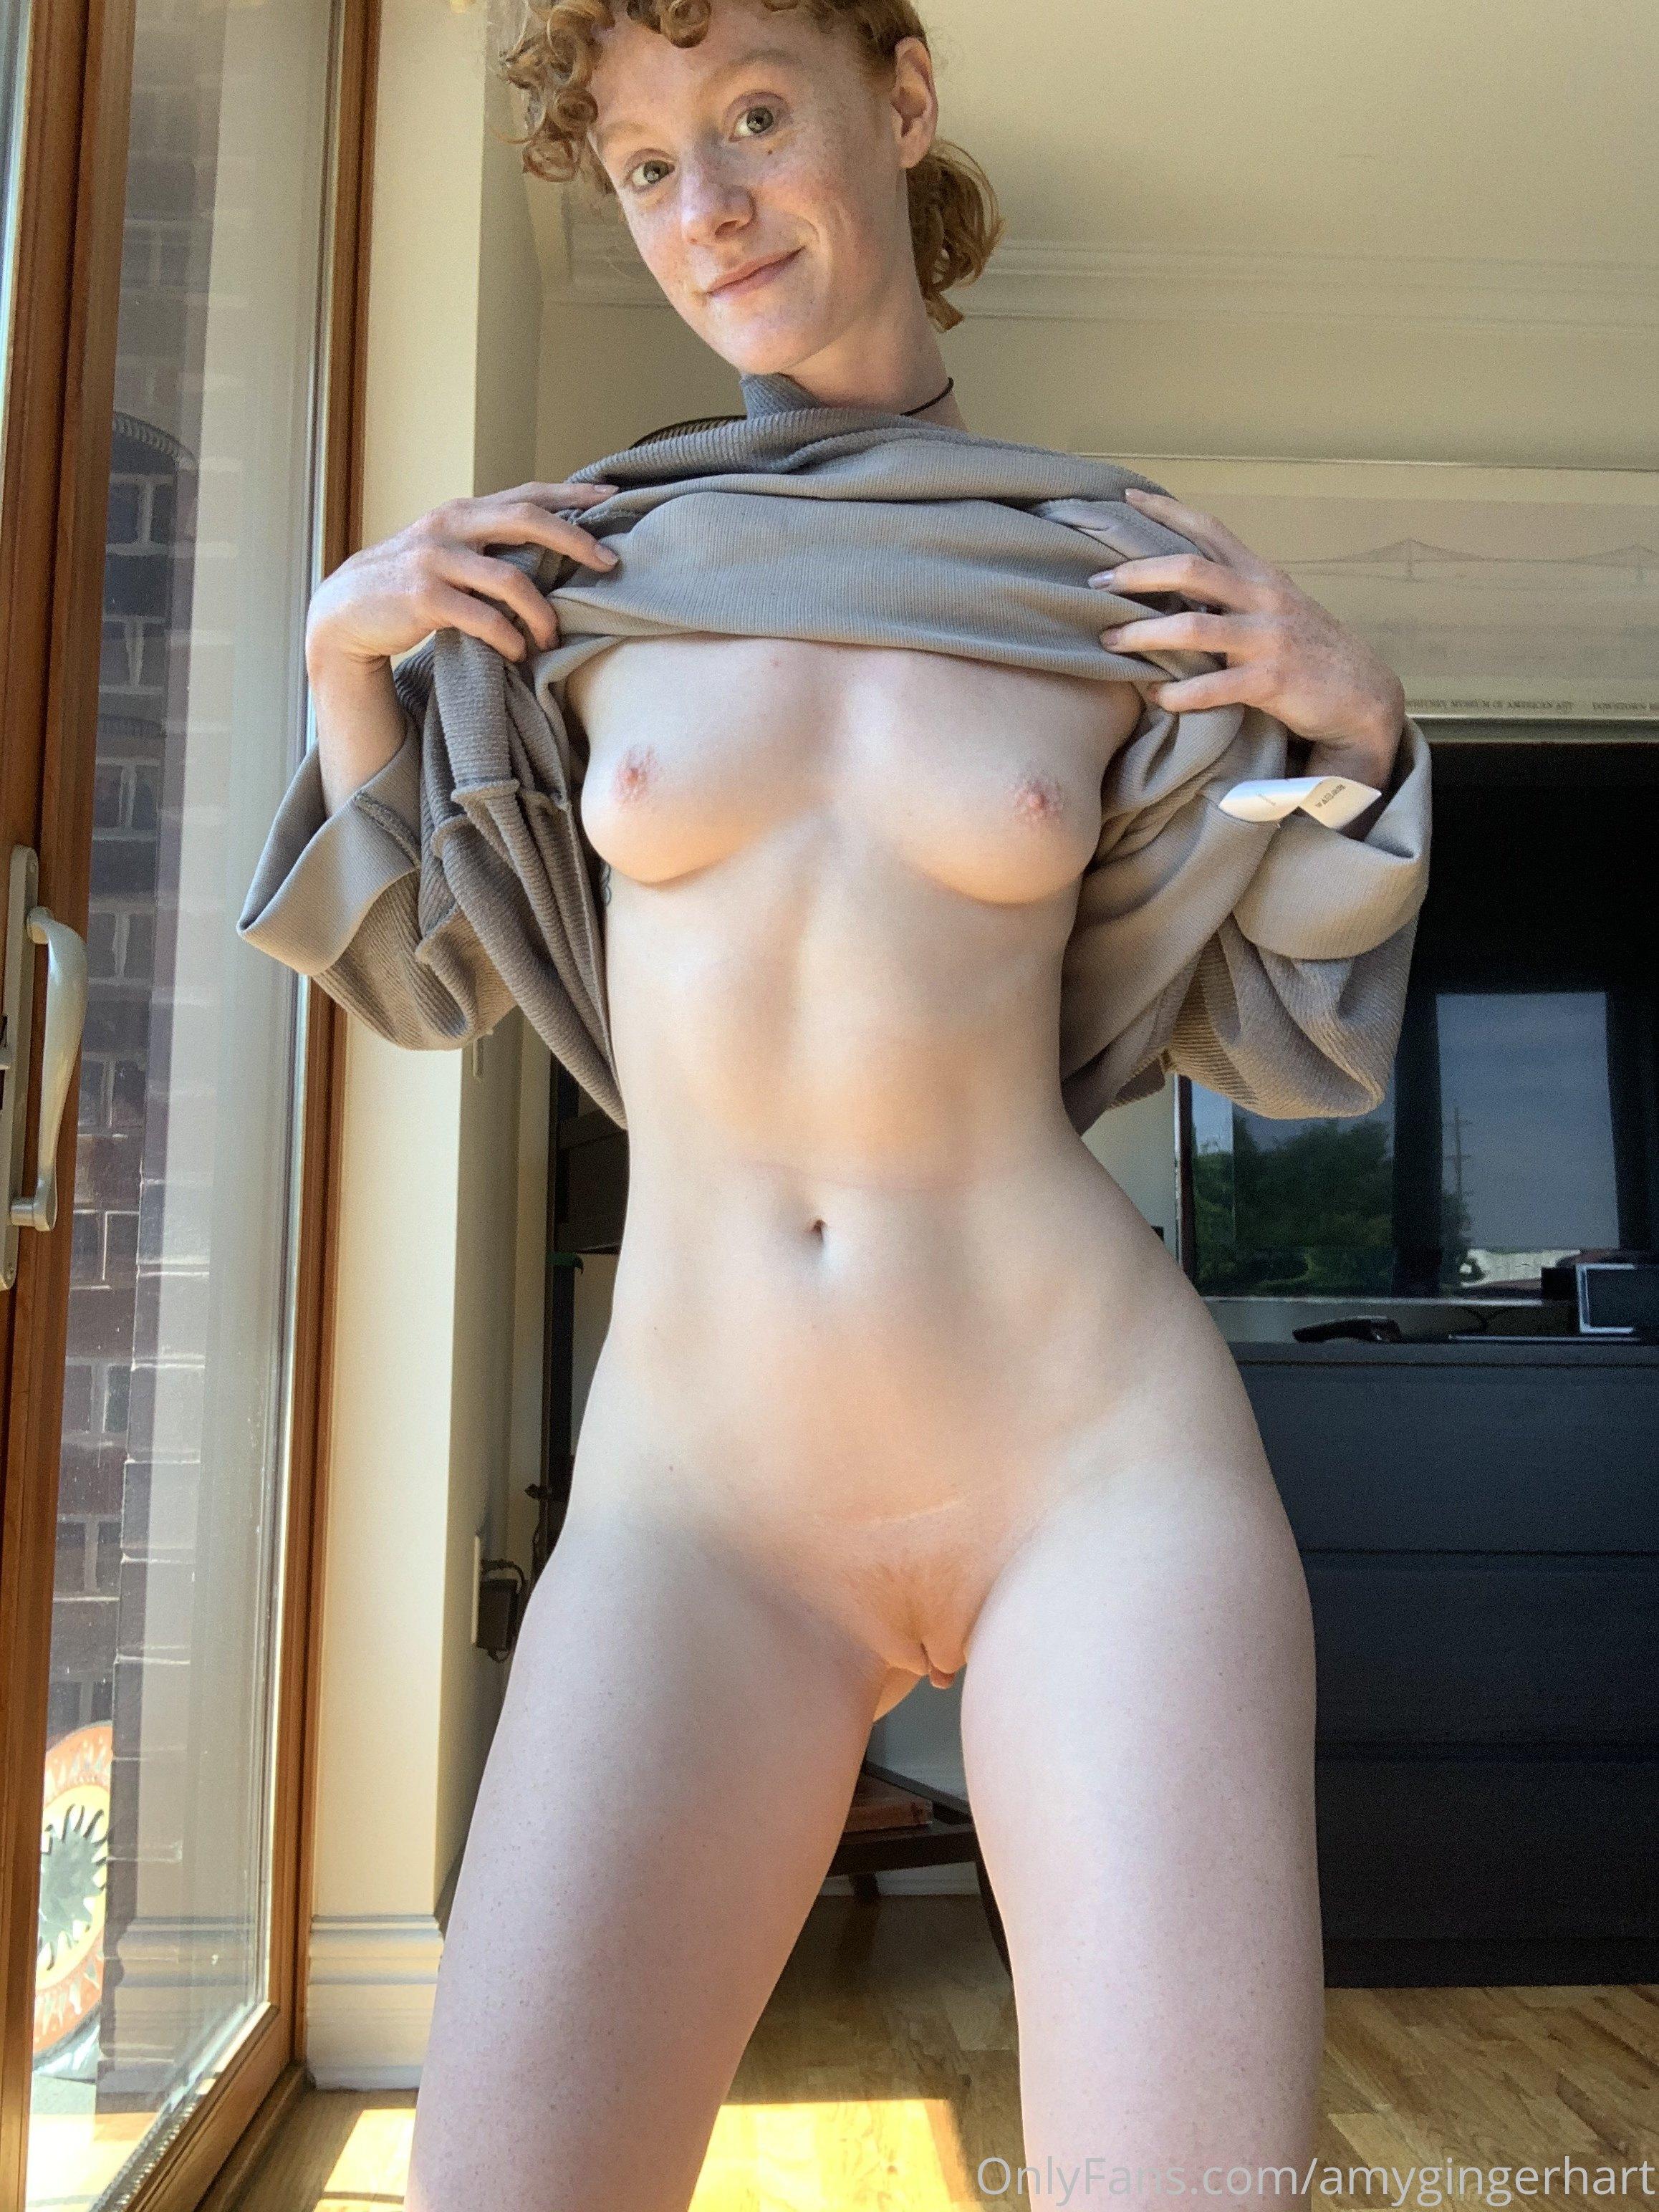 Amy Hart, Amygingerhart, Onlyfans 0097